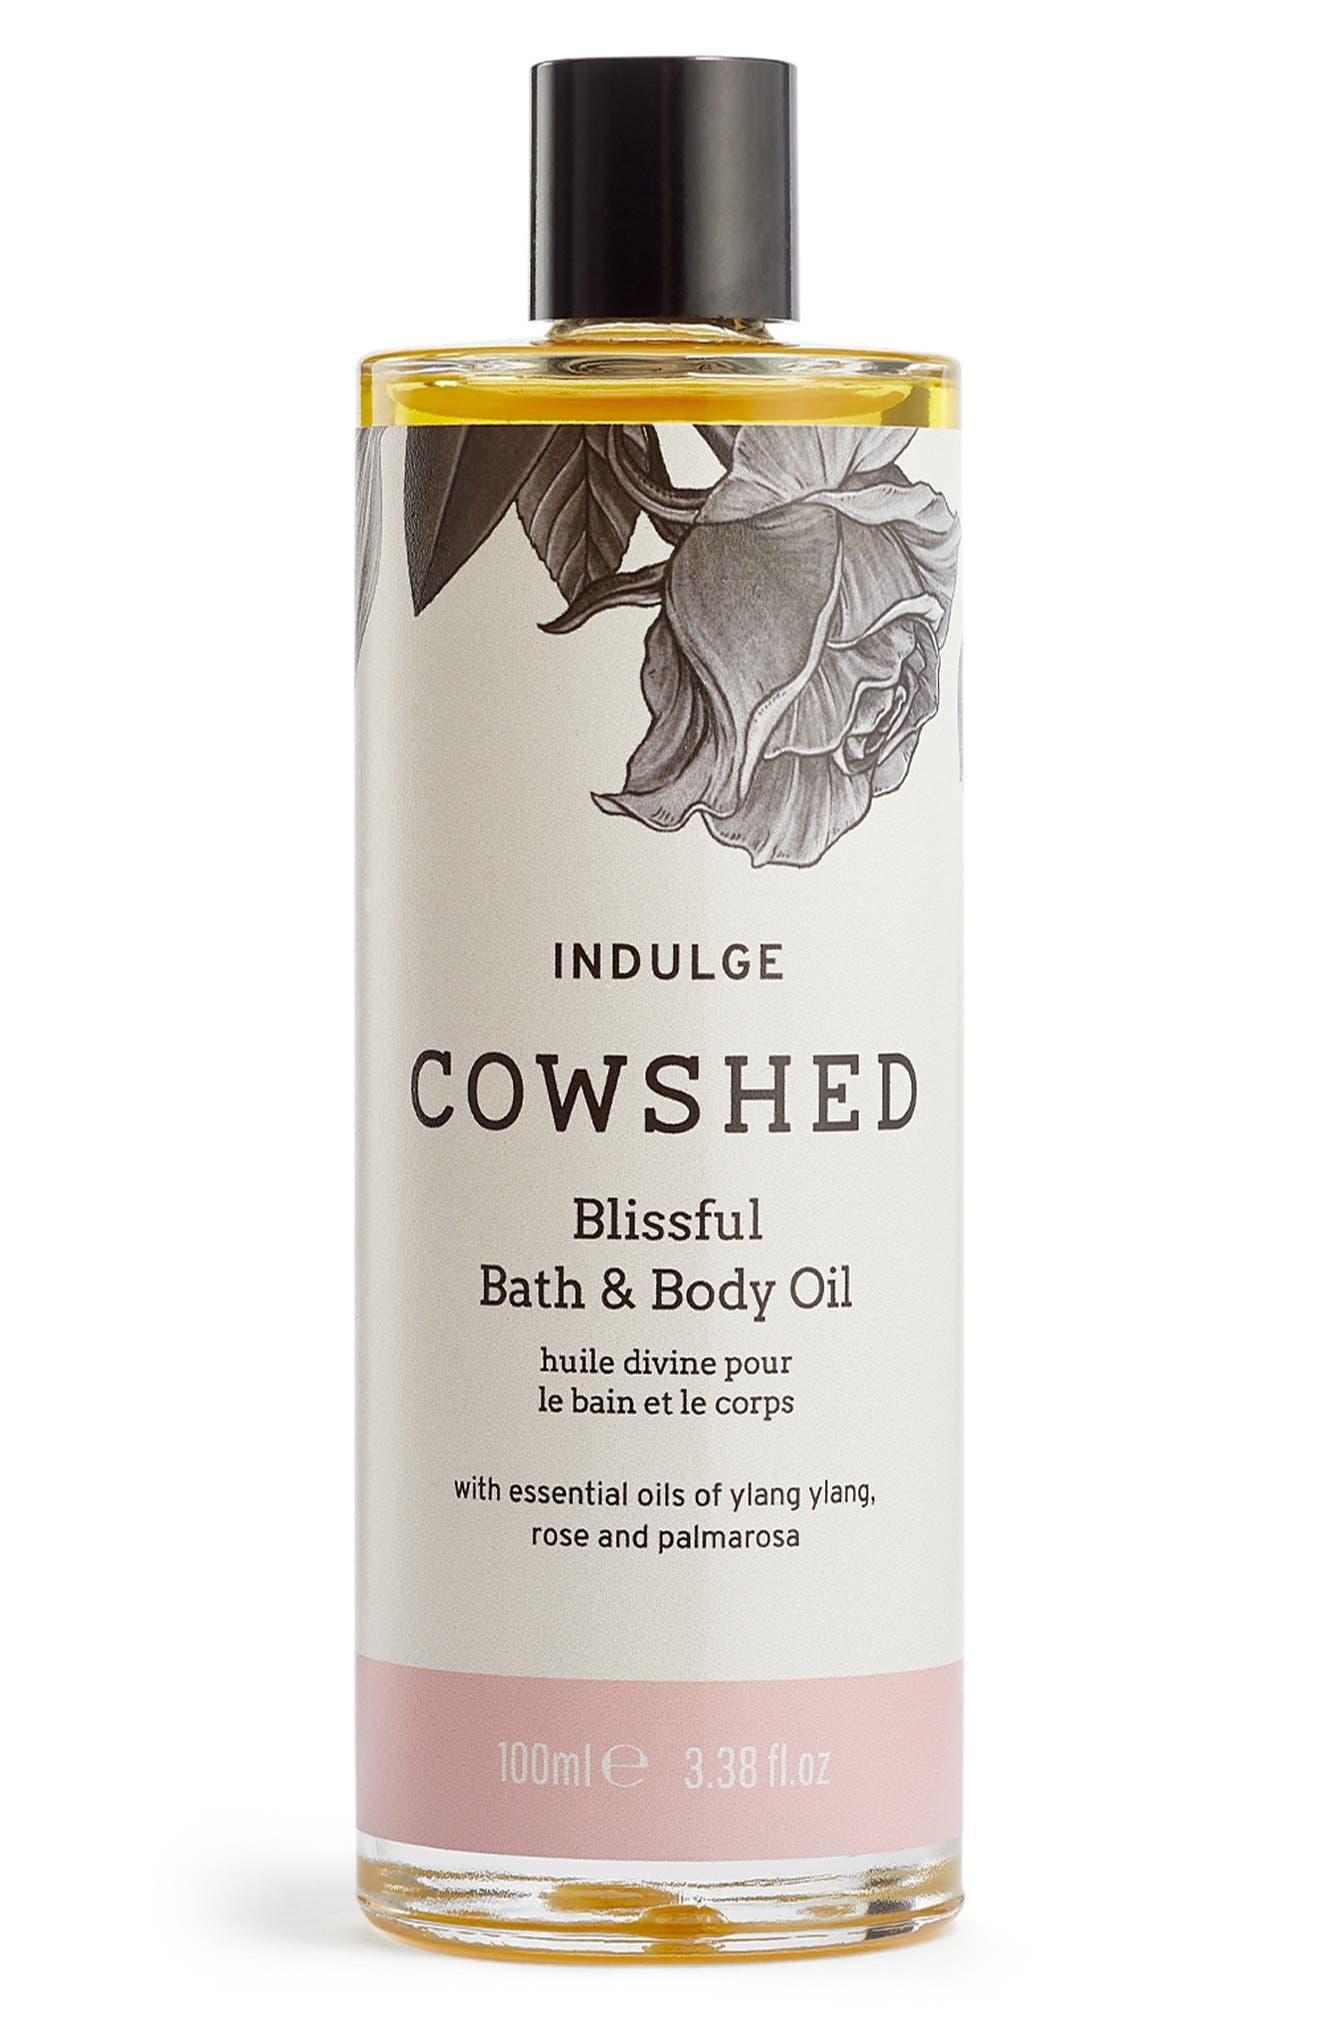 Indulge Blissful Bath & Body Oil